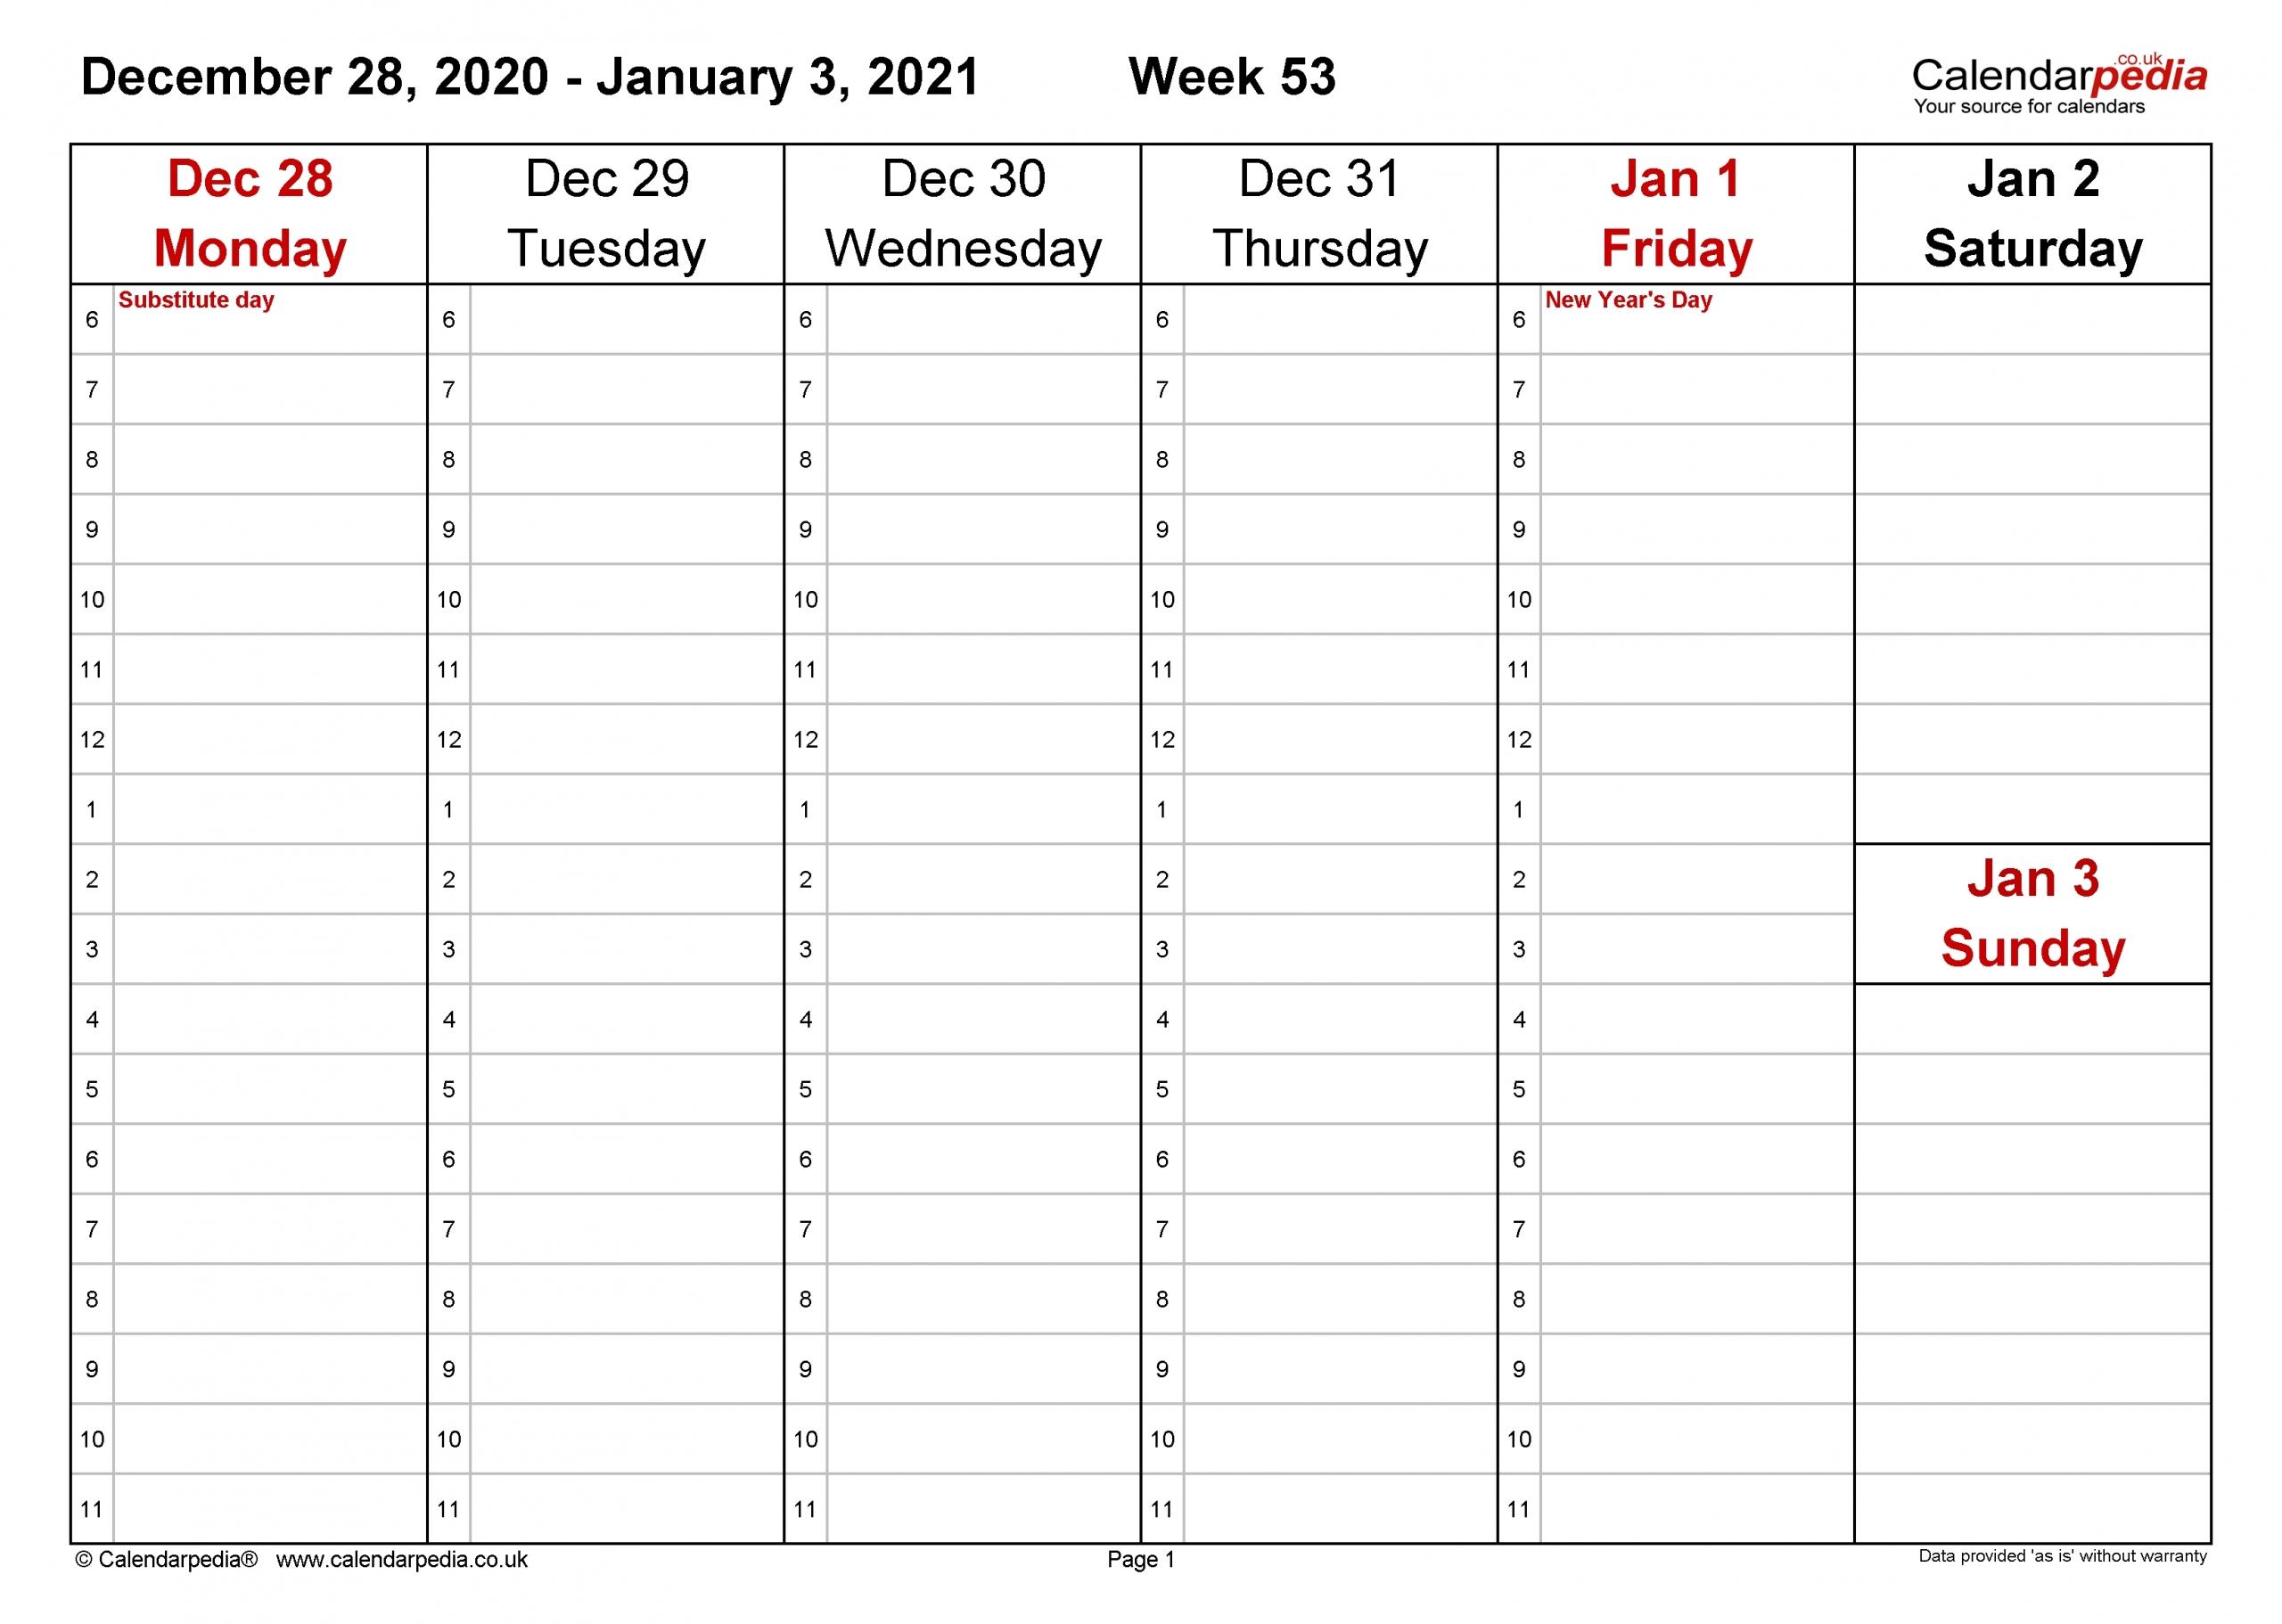 2021 Calnderweek No Excel | Calendar Template Printable with Print Calendar 2021 In Excel Photo